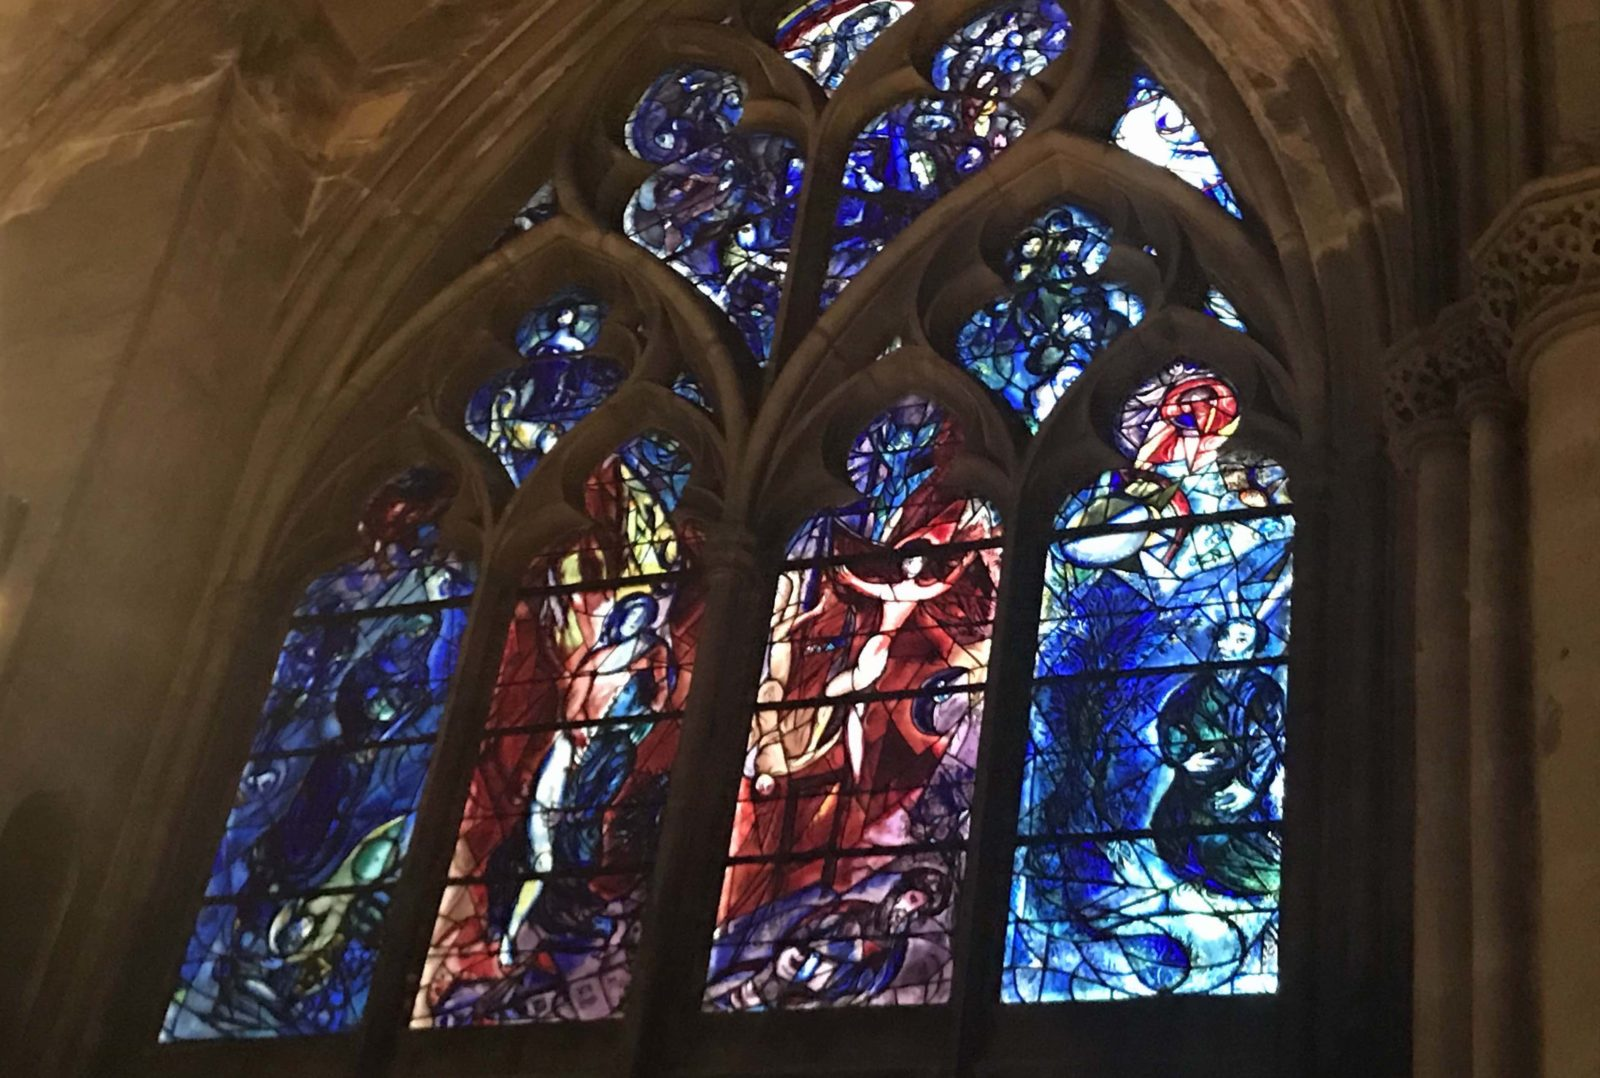 Metz cathédrale vitraux Chagall